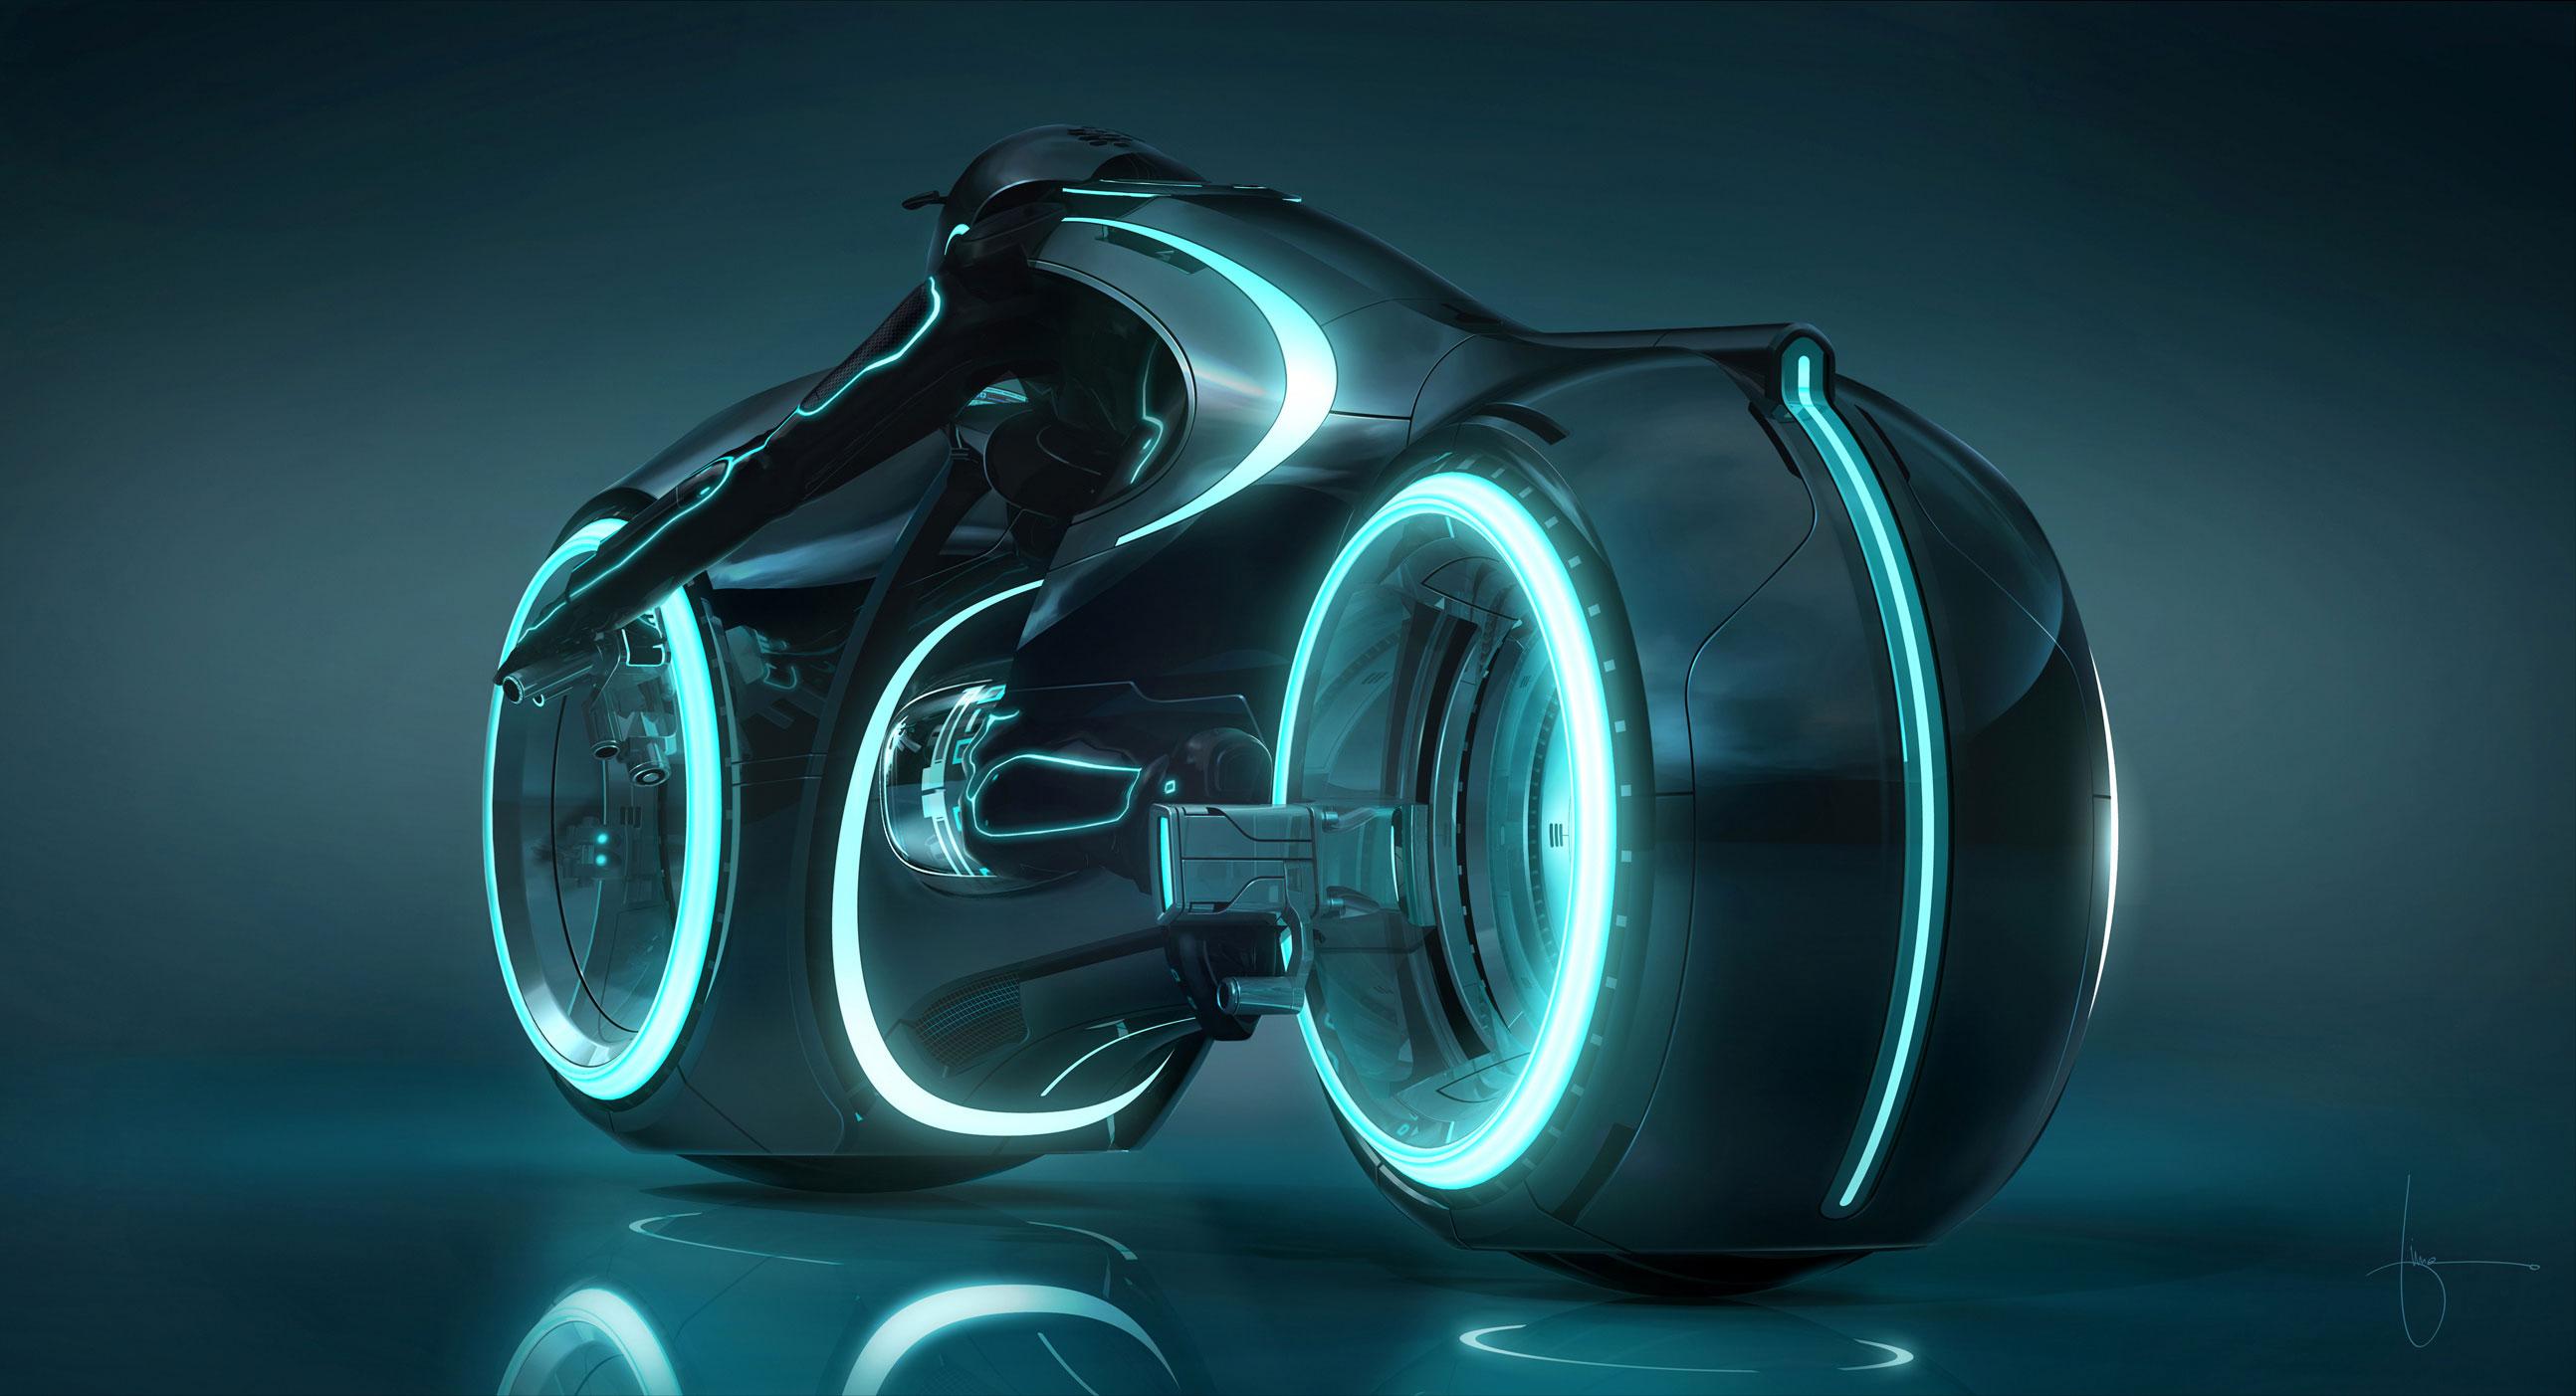 tron_legacy_lightcycle.jpg